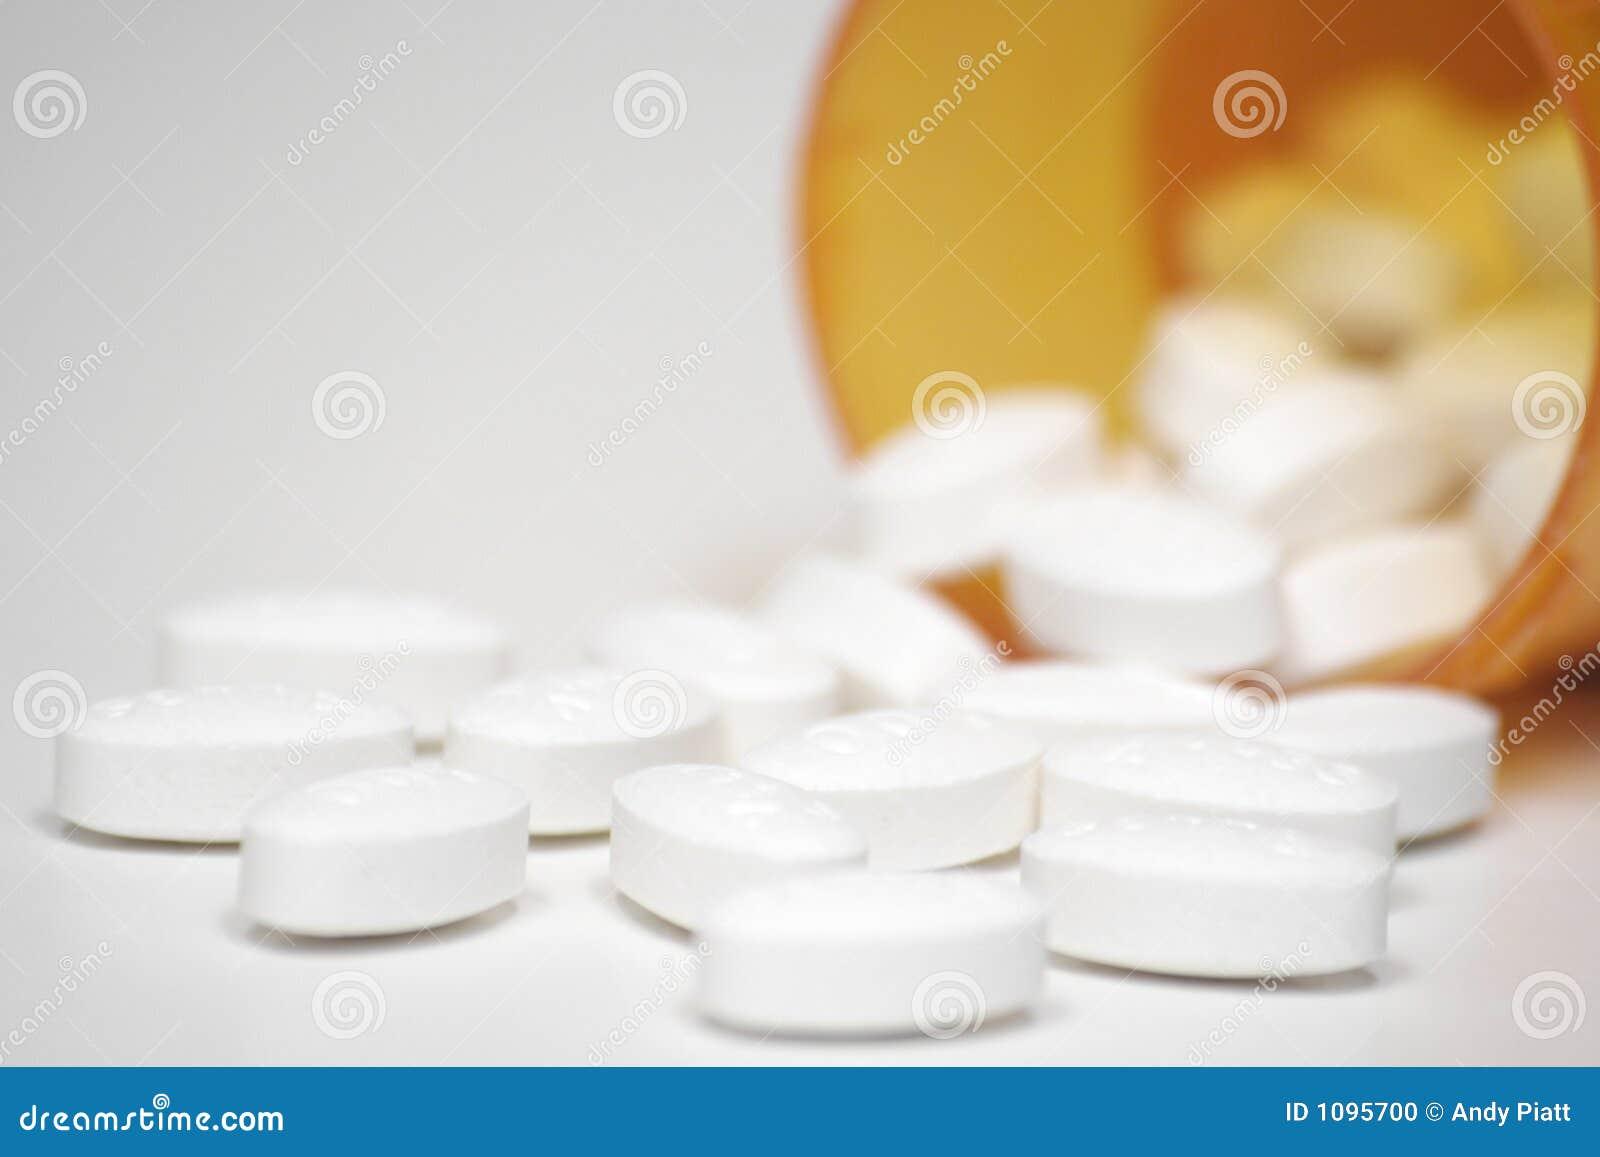 Tabletki recepturowe narkotyk